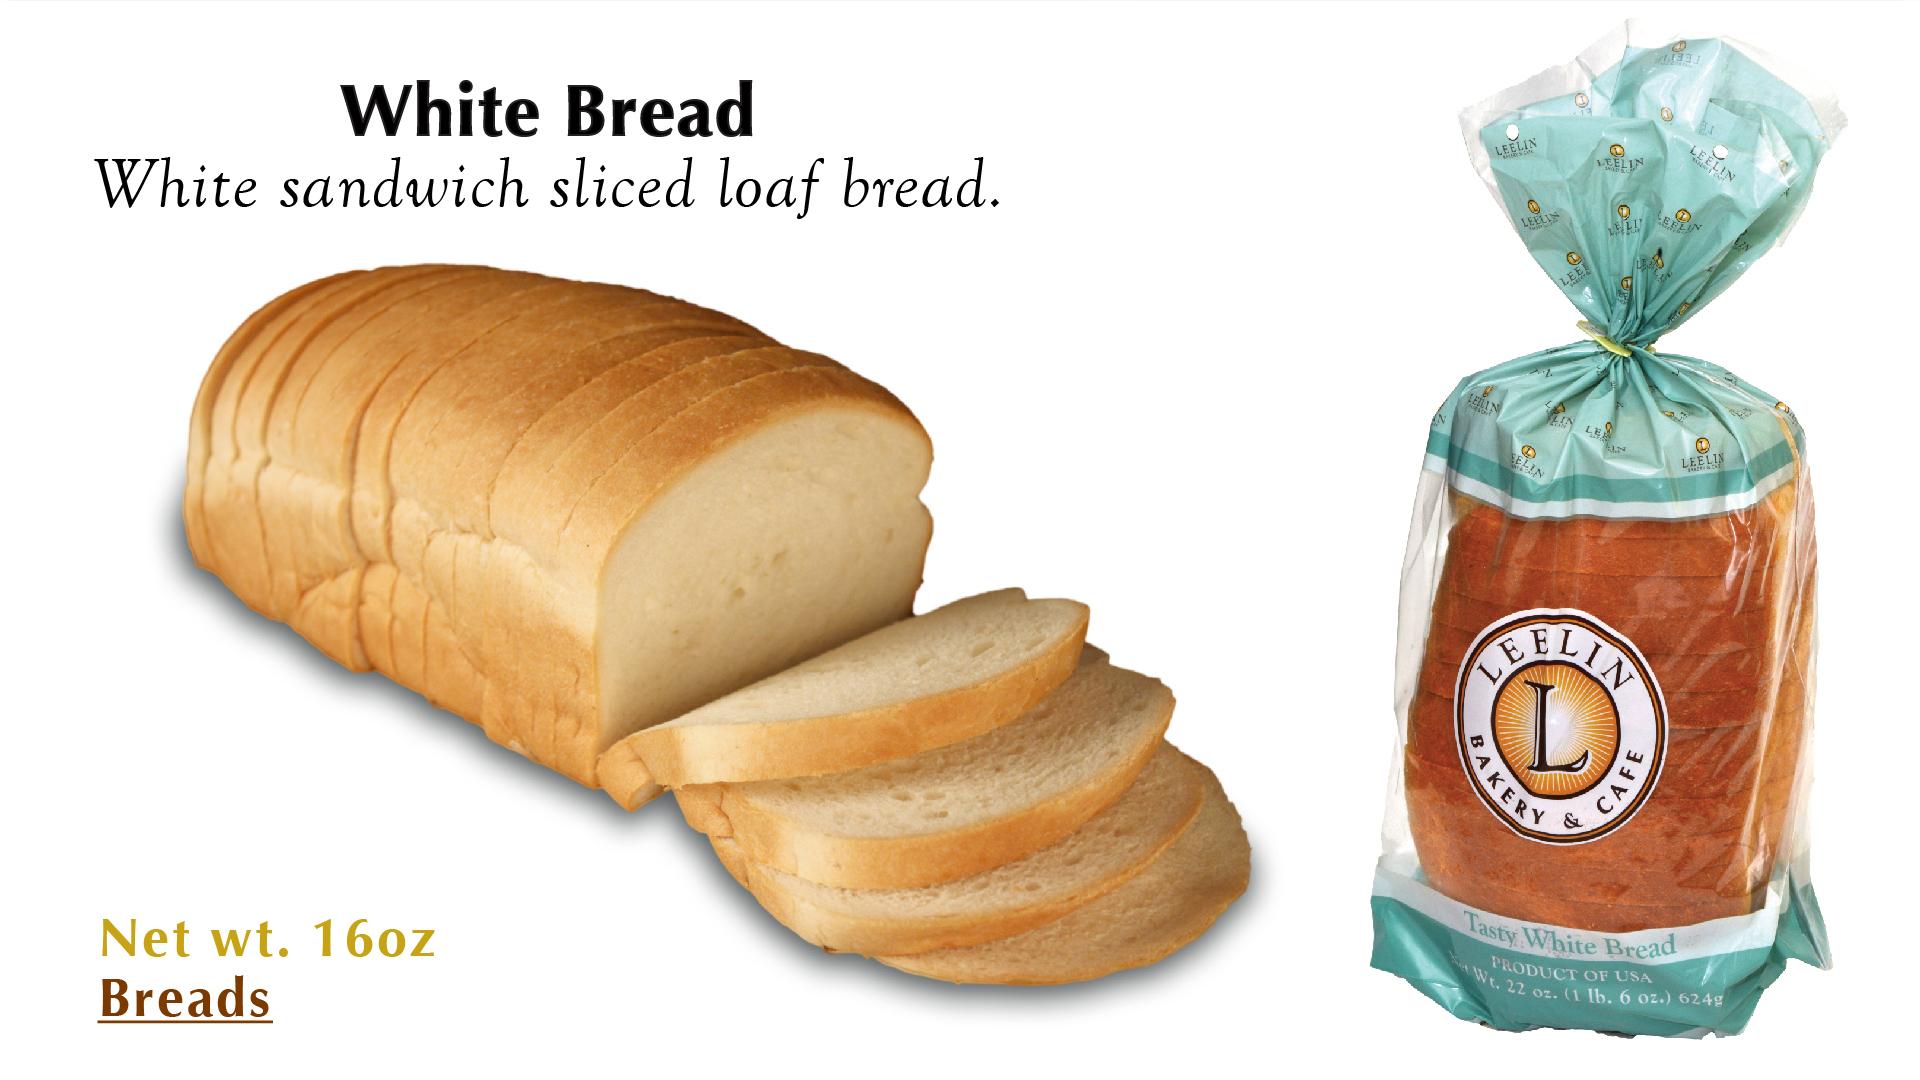 008 White Loaf Bread 1920x1080.jpg